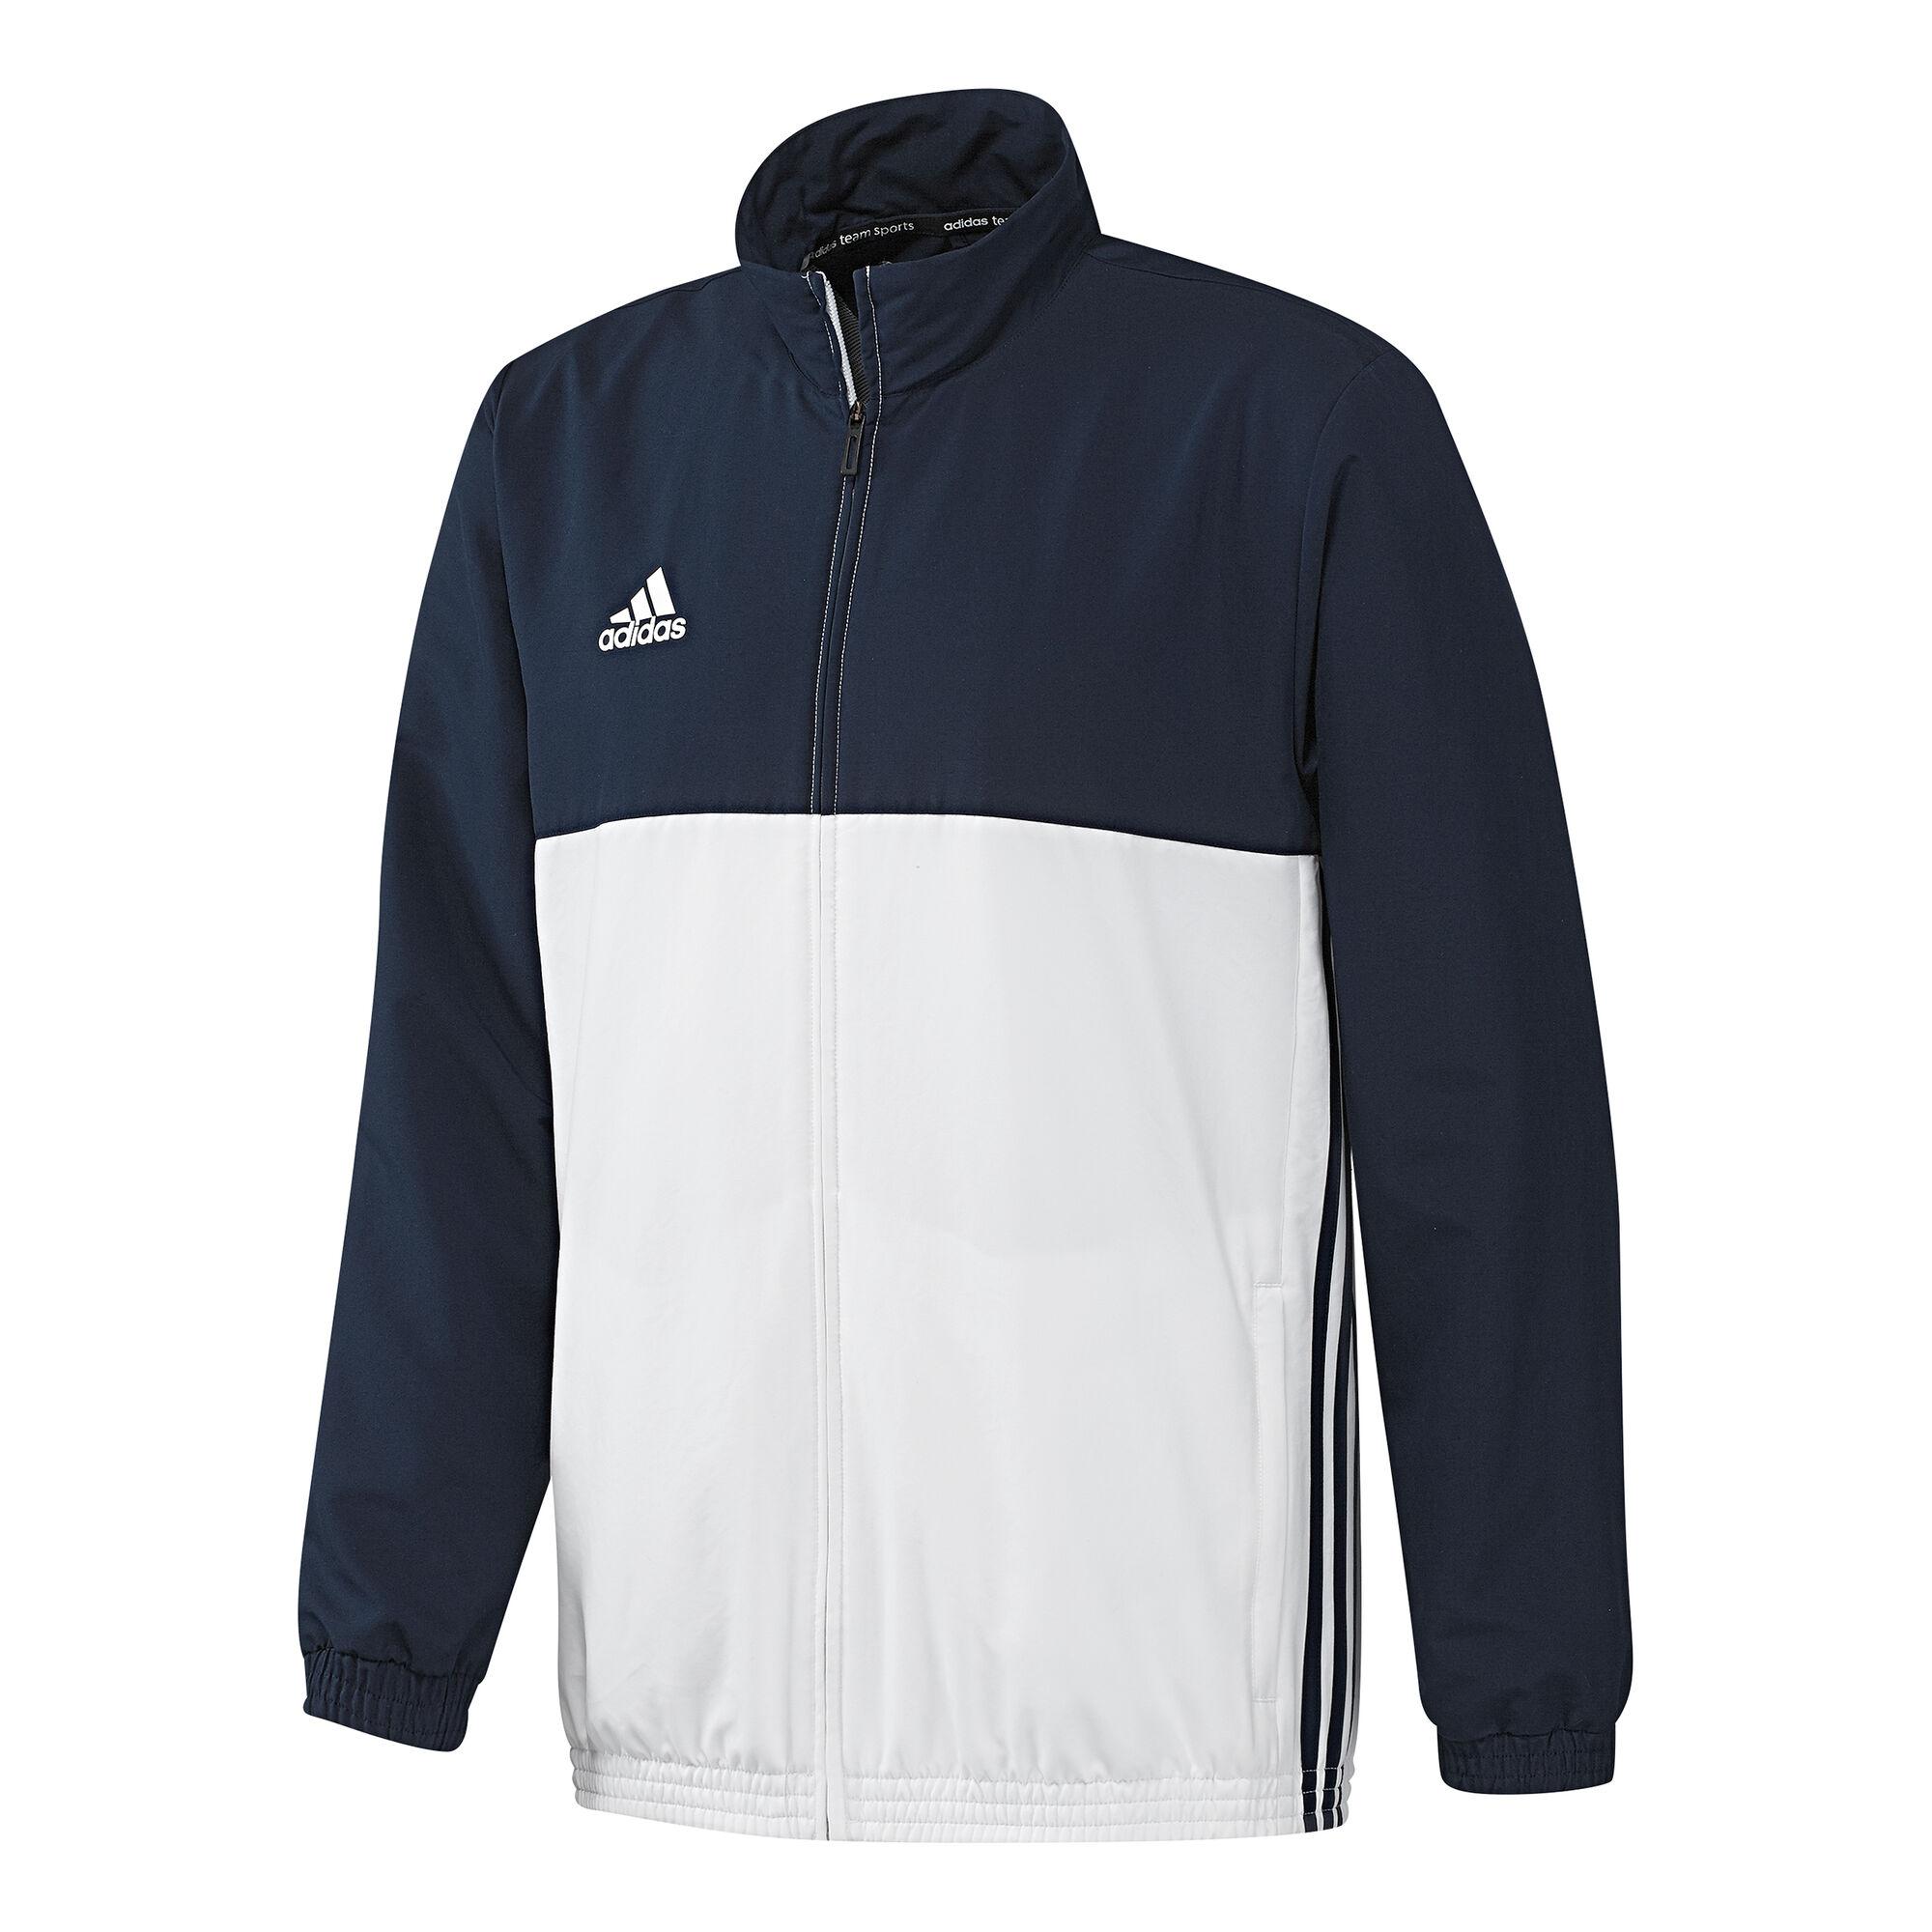 cheap for discount da1b1 f78b2 adidas T16 Team Jacket Trainingsjacke Herren - Dunkelblau ...